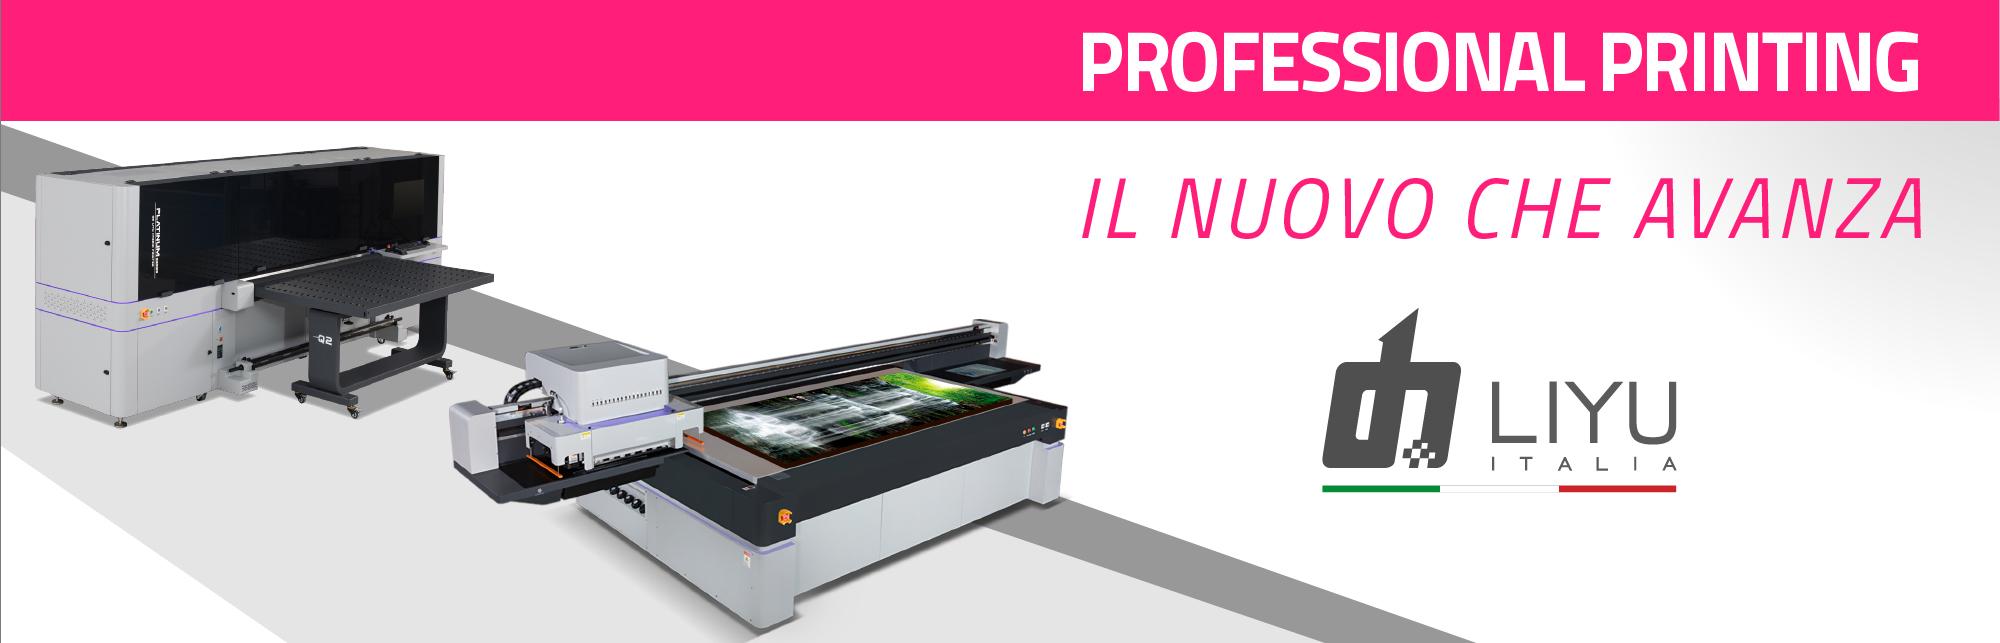 Liyu Italia Professional Printing